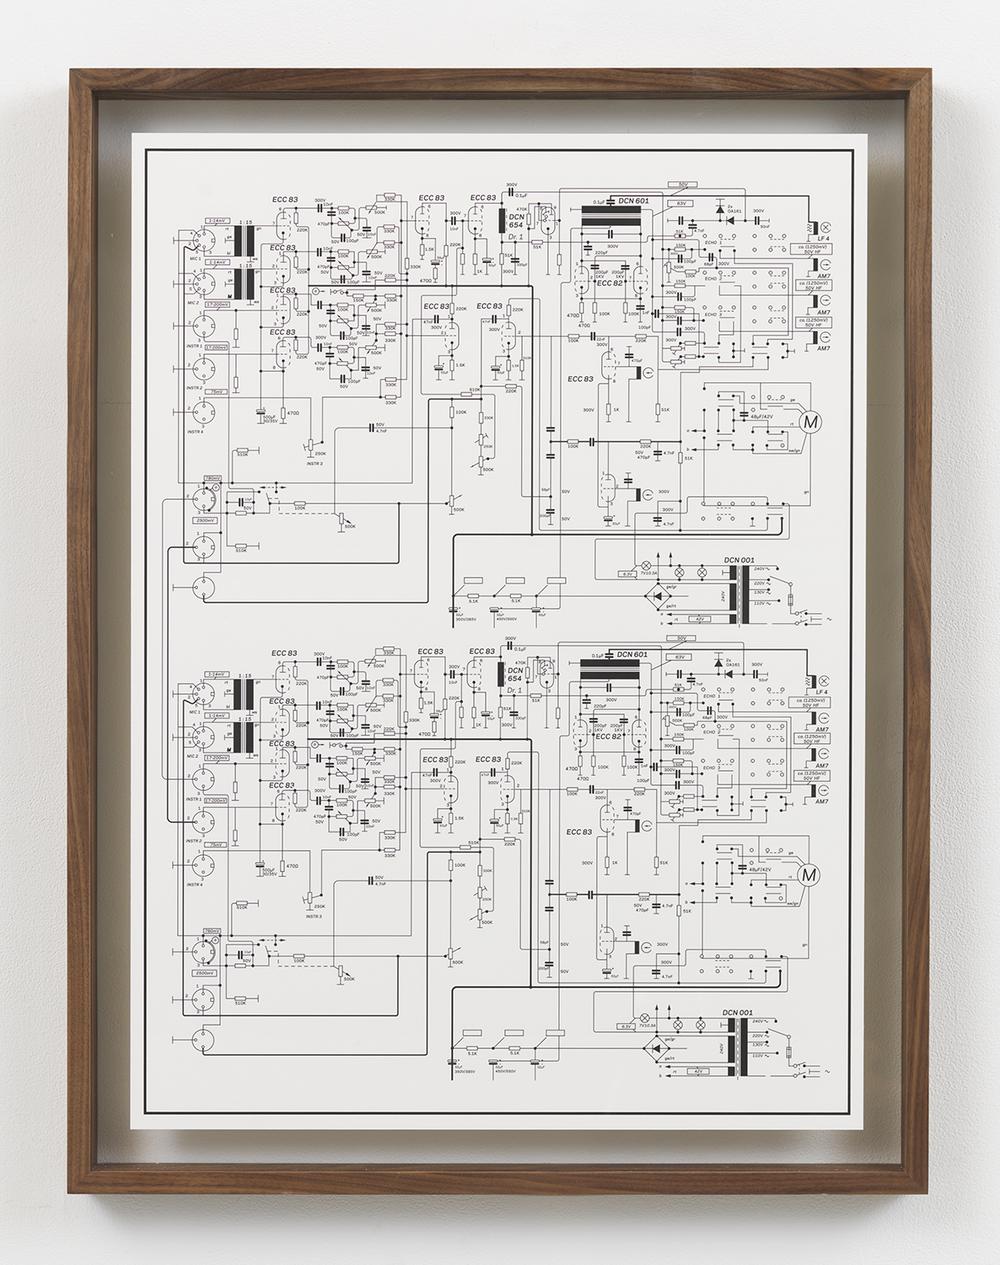 Echolette Cascade, 2015 Inkjet print in artist frame 33.75 x 25.75 inches